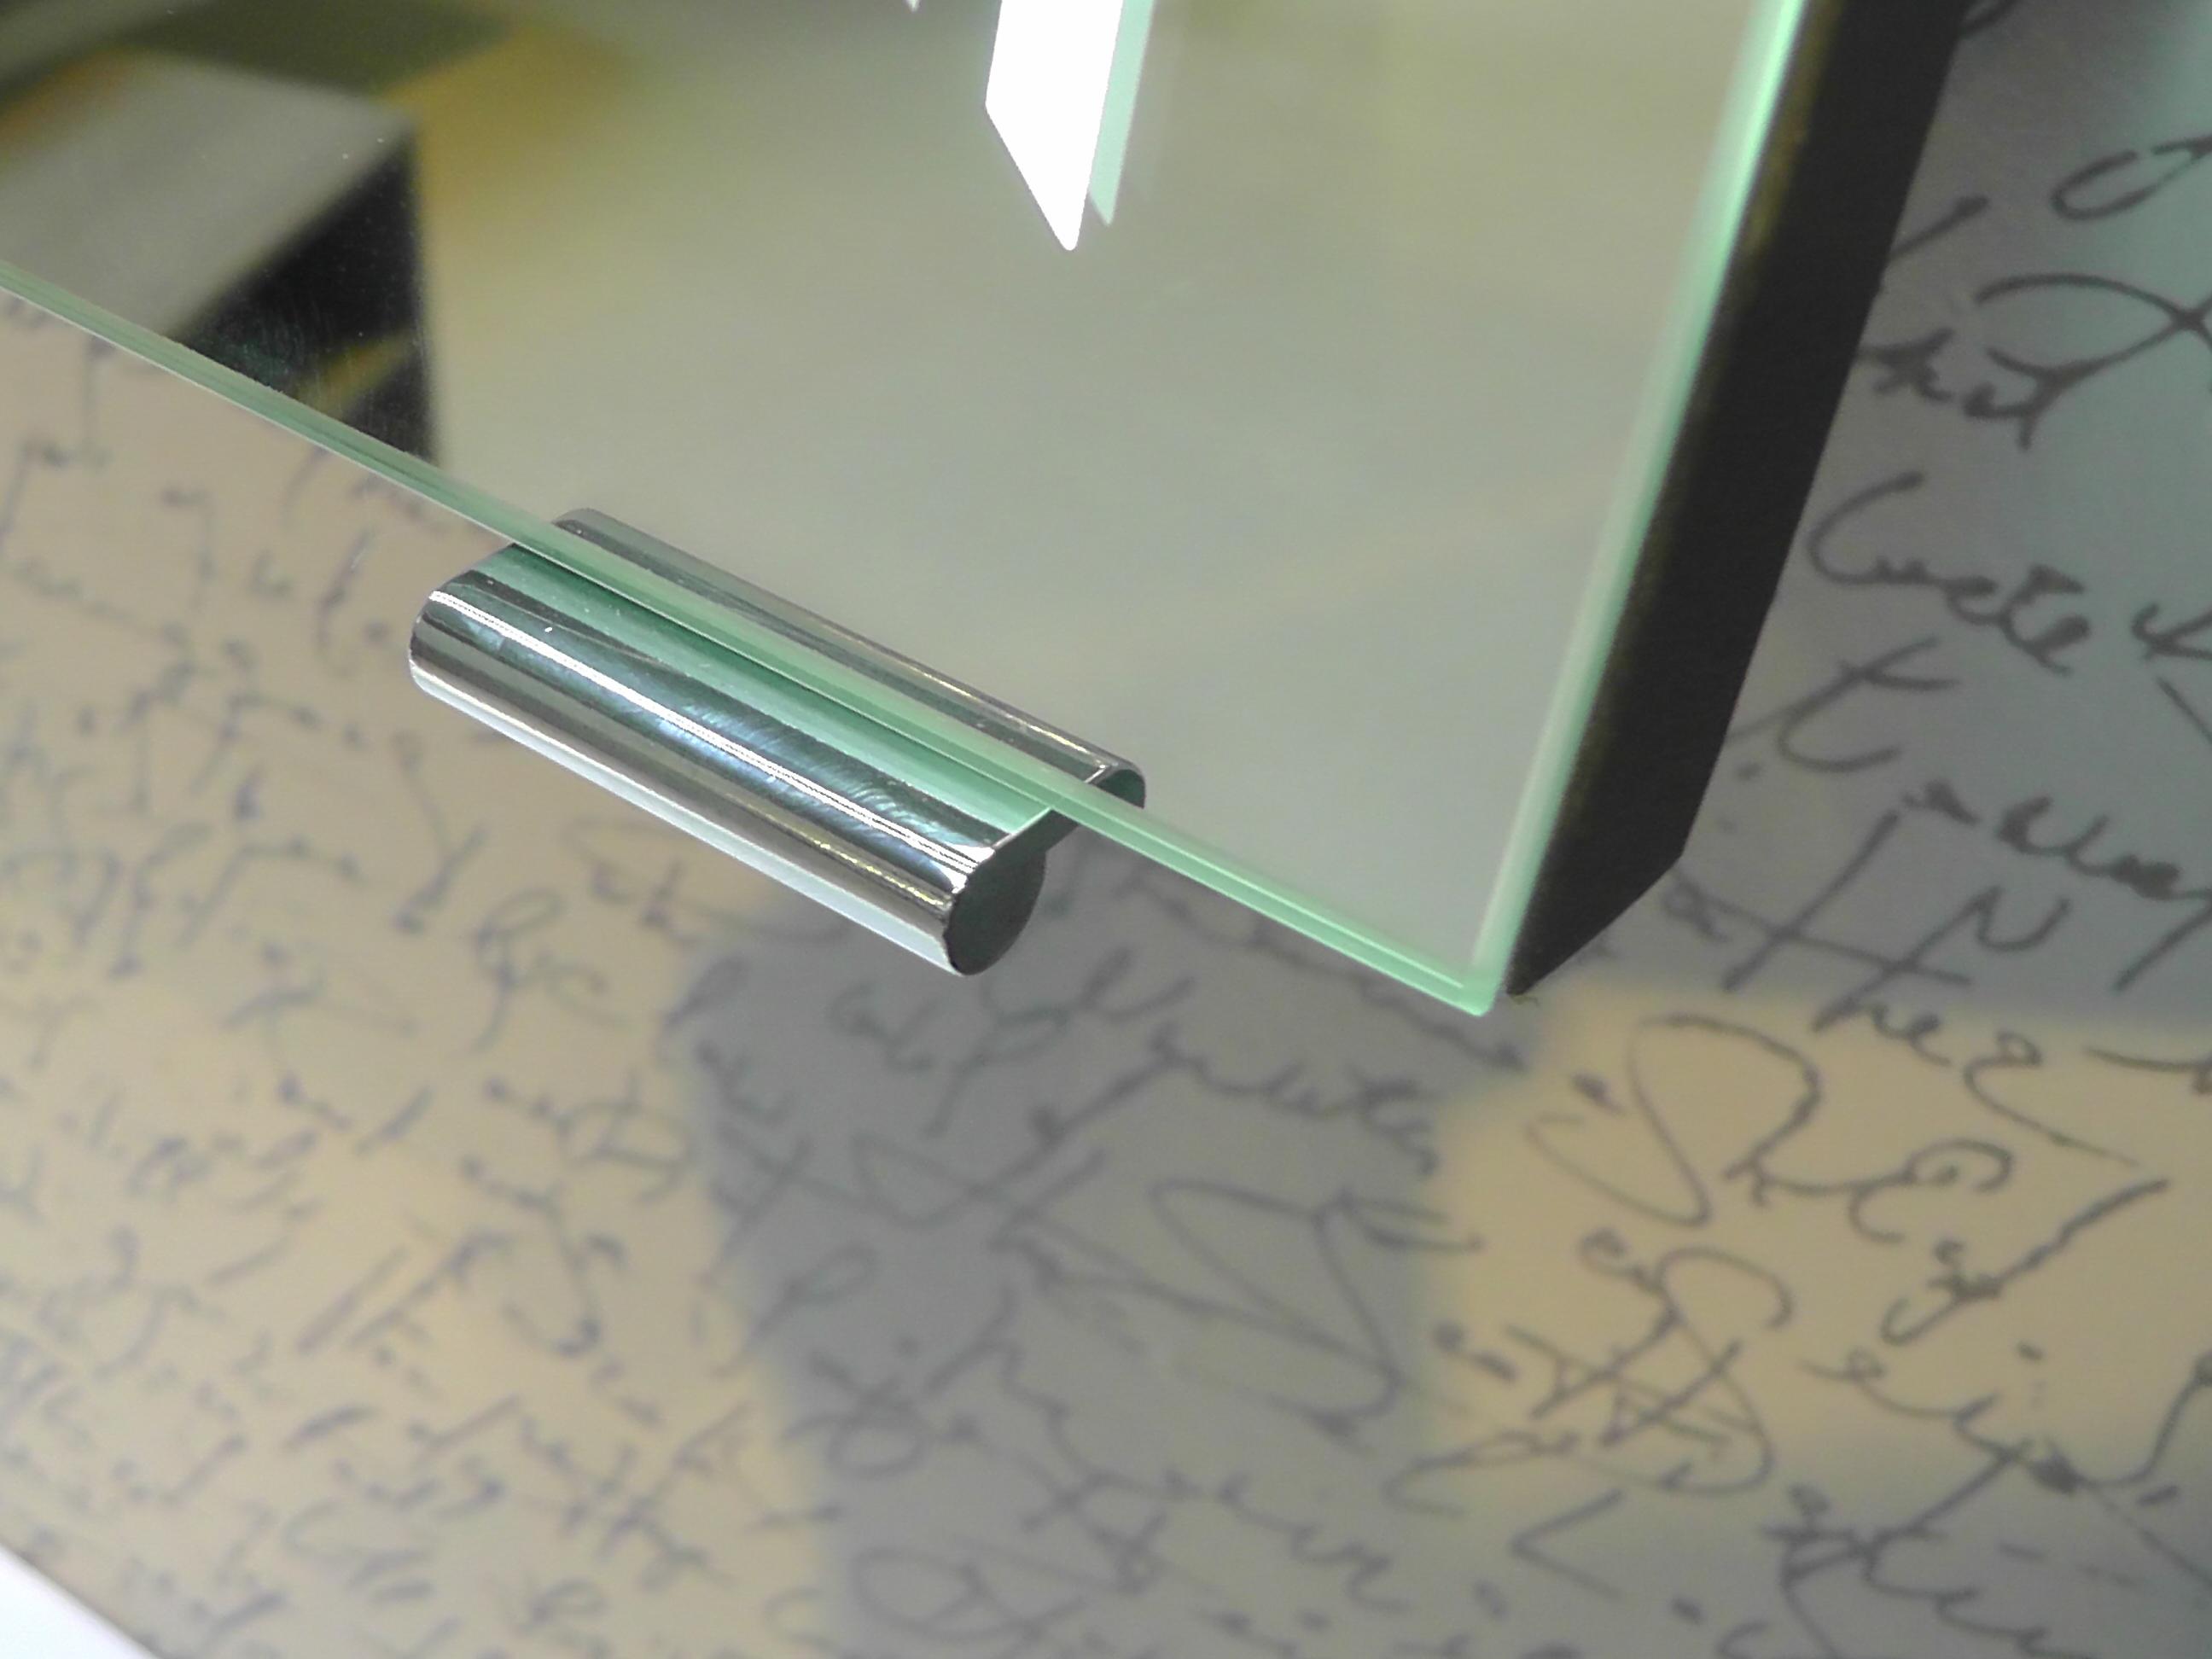 Spiegelschank pelipal contea 128 cm arcom center for Griffe fur badmobel